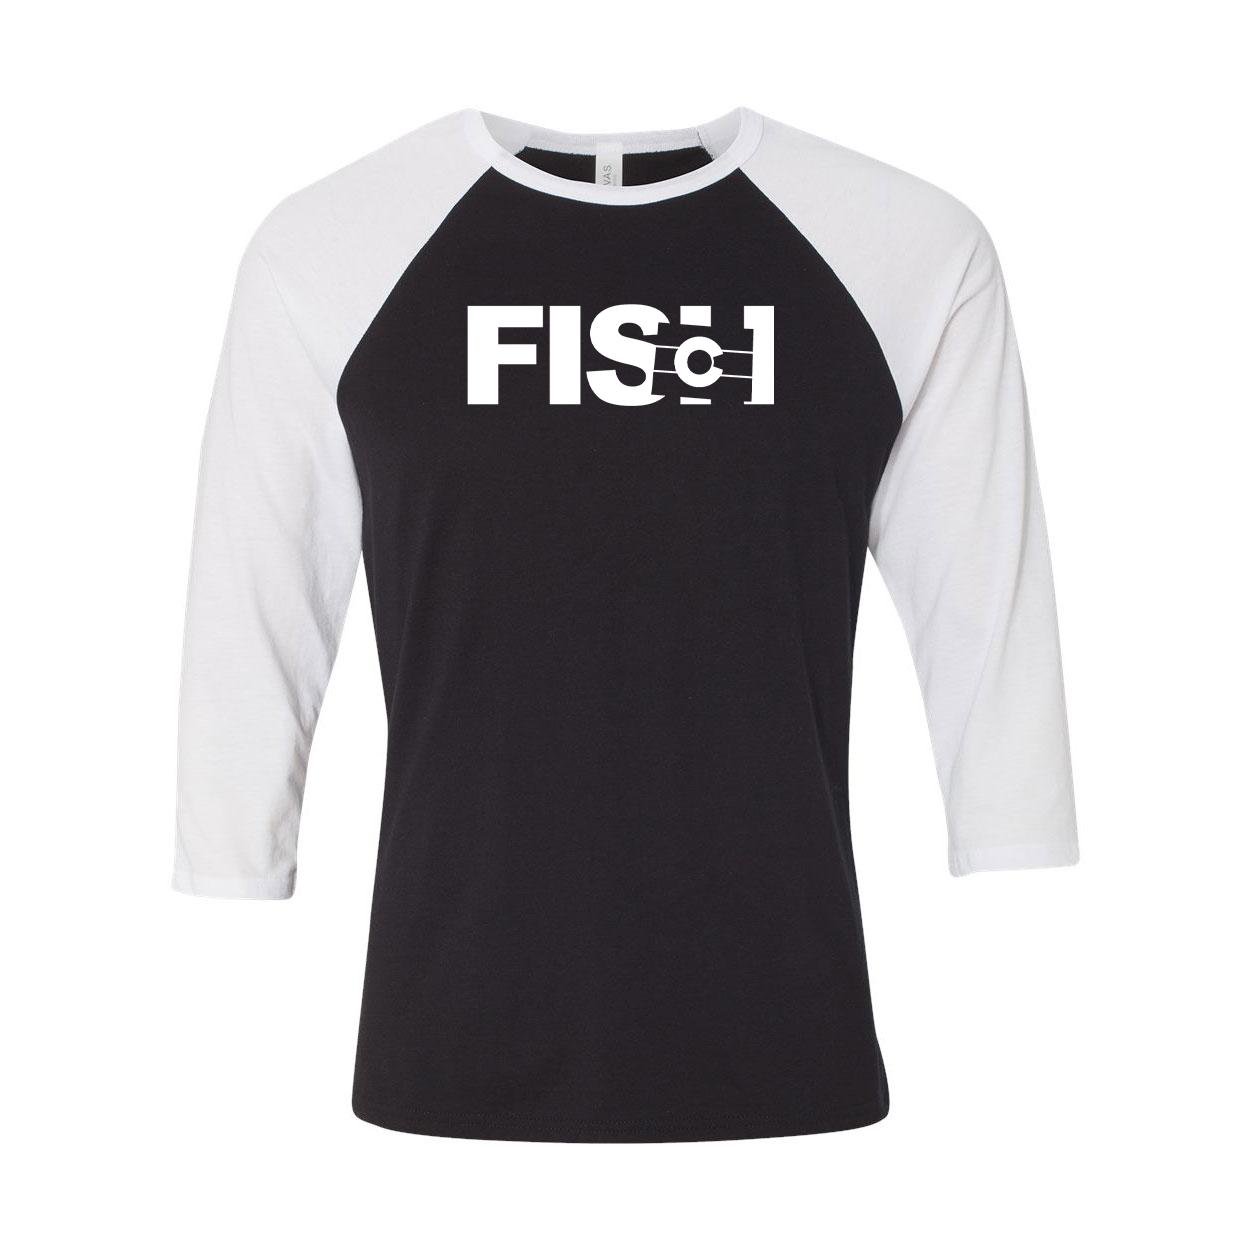 Fish Colorado Classic Raglan Shirt Black/White (White Logo)